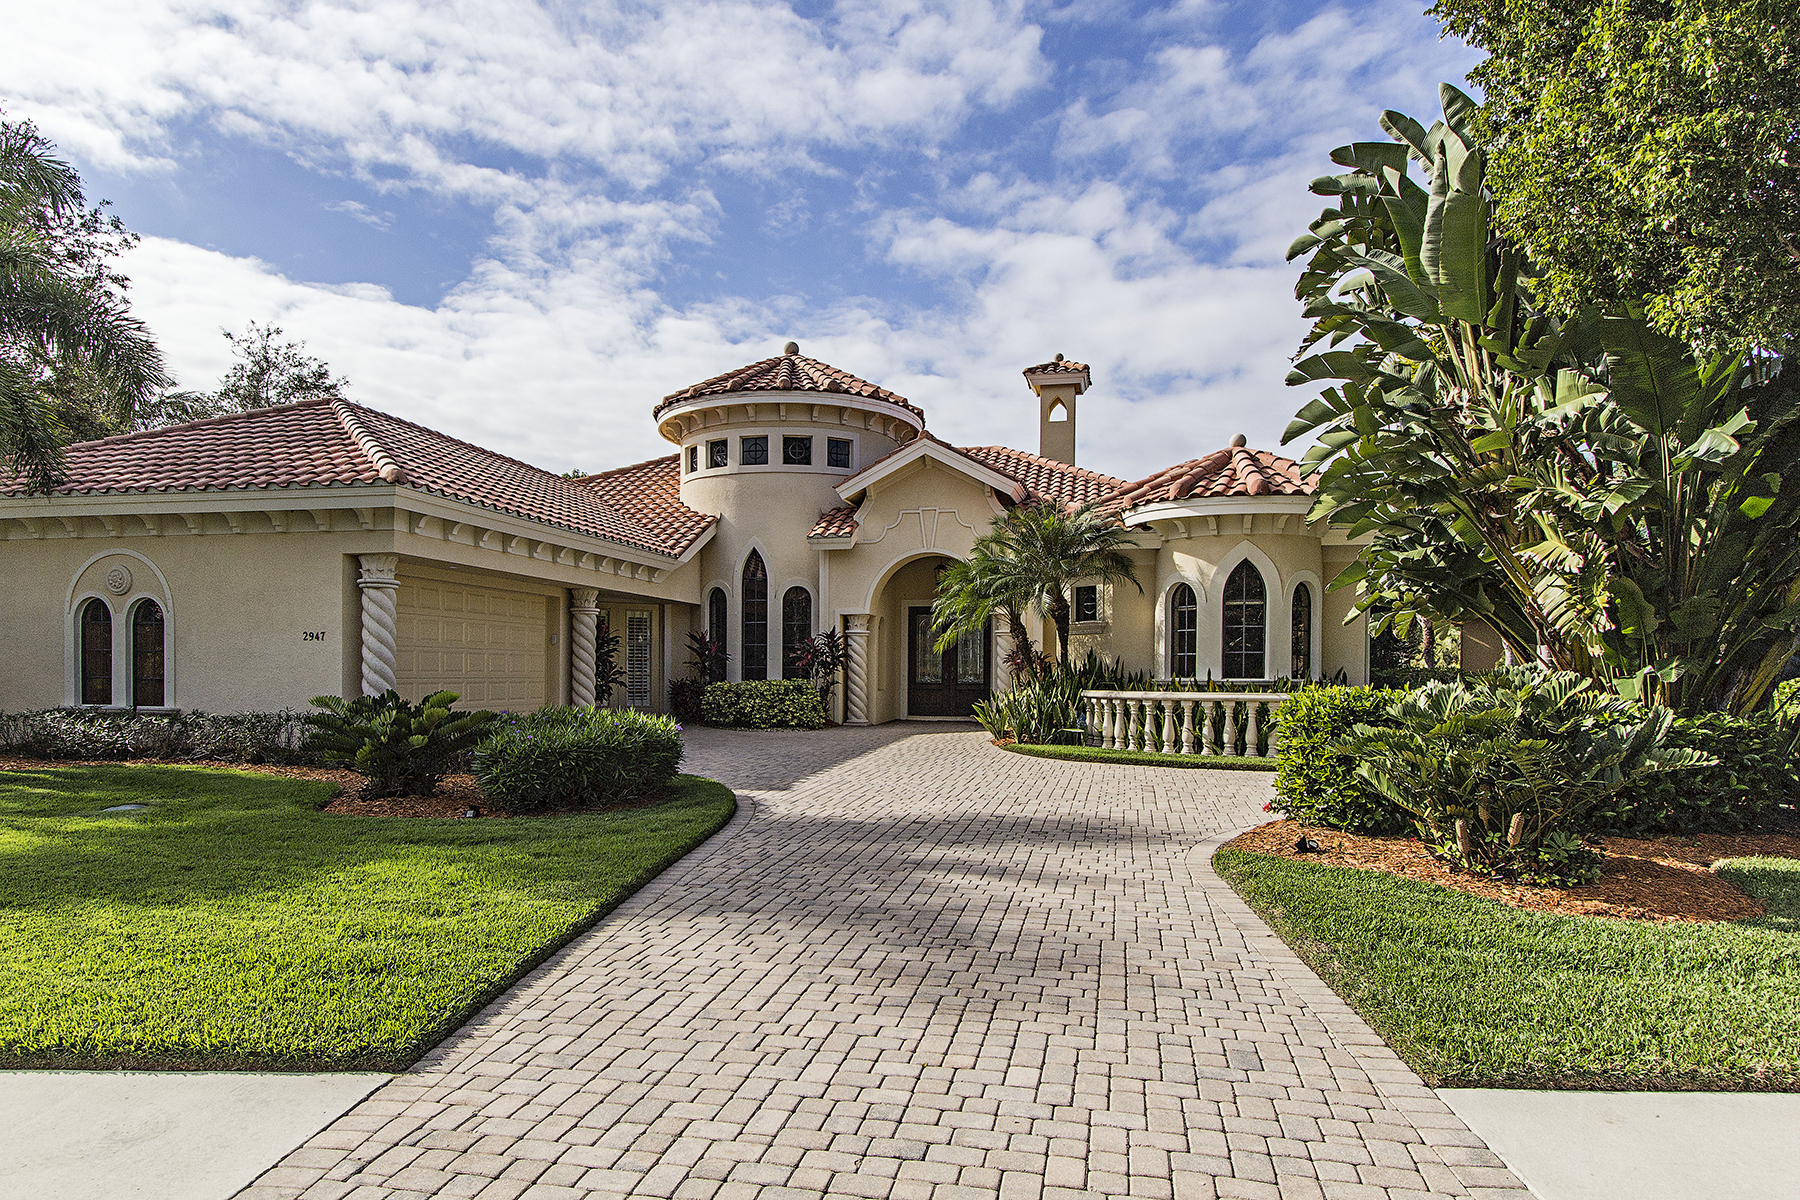 Single Family Home for Sale at Naples 2947 Mona Lisa Blvd, Naples, Florida 34119 United States